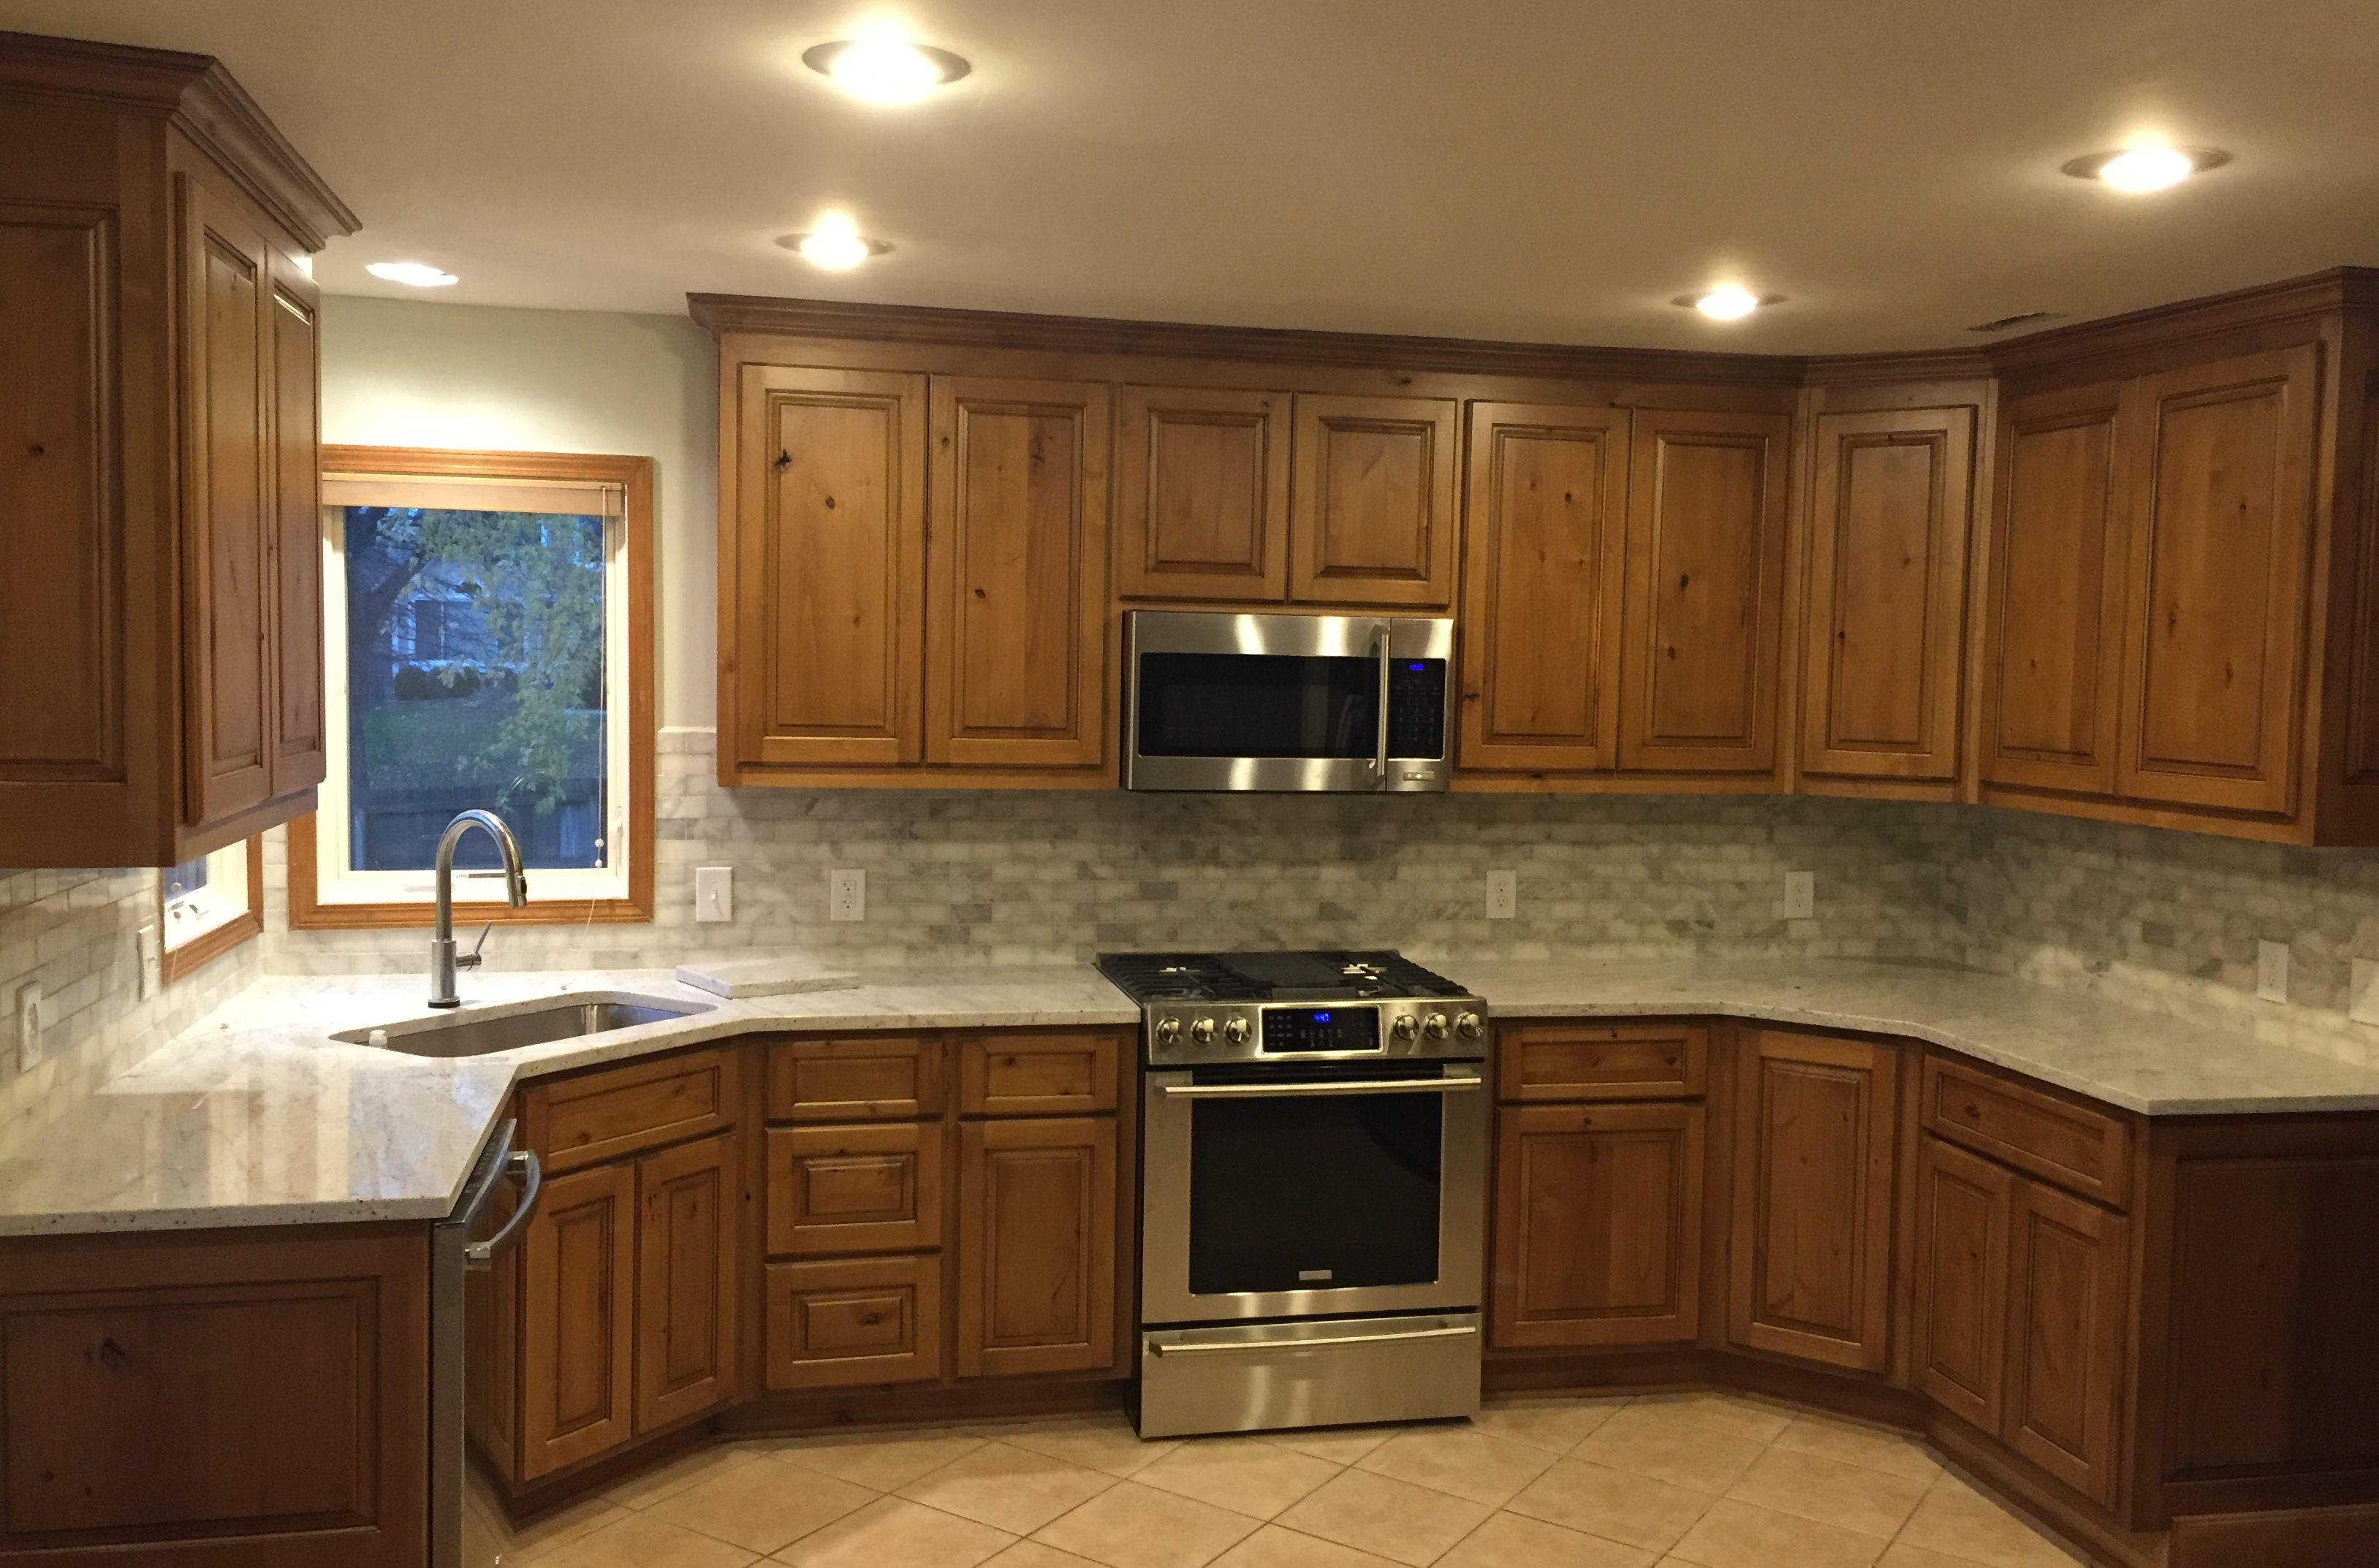 cabinets countertops and backsplash